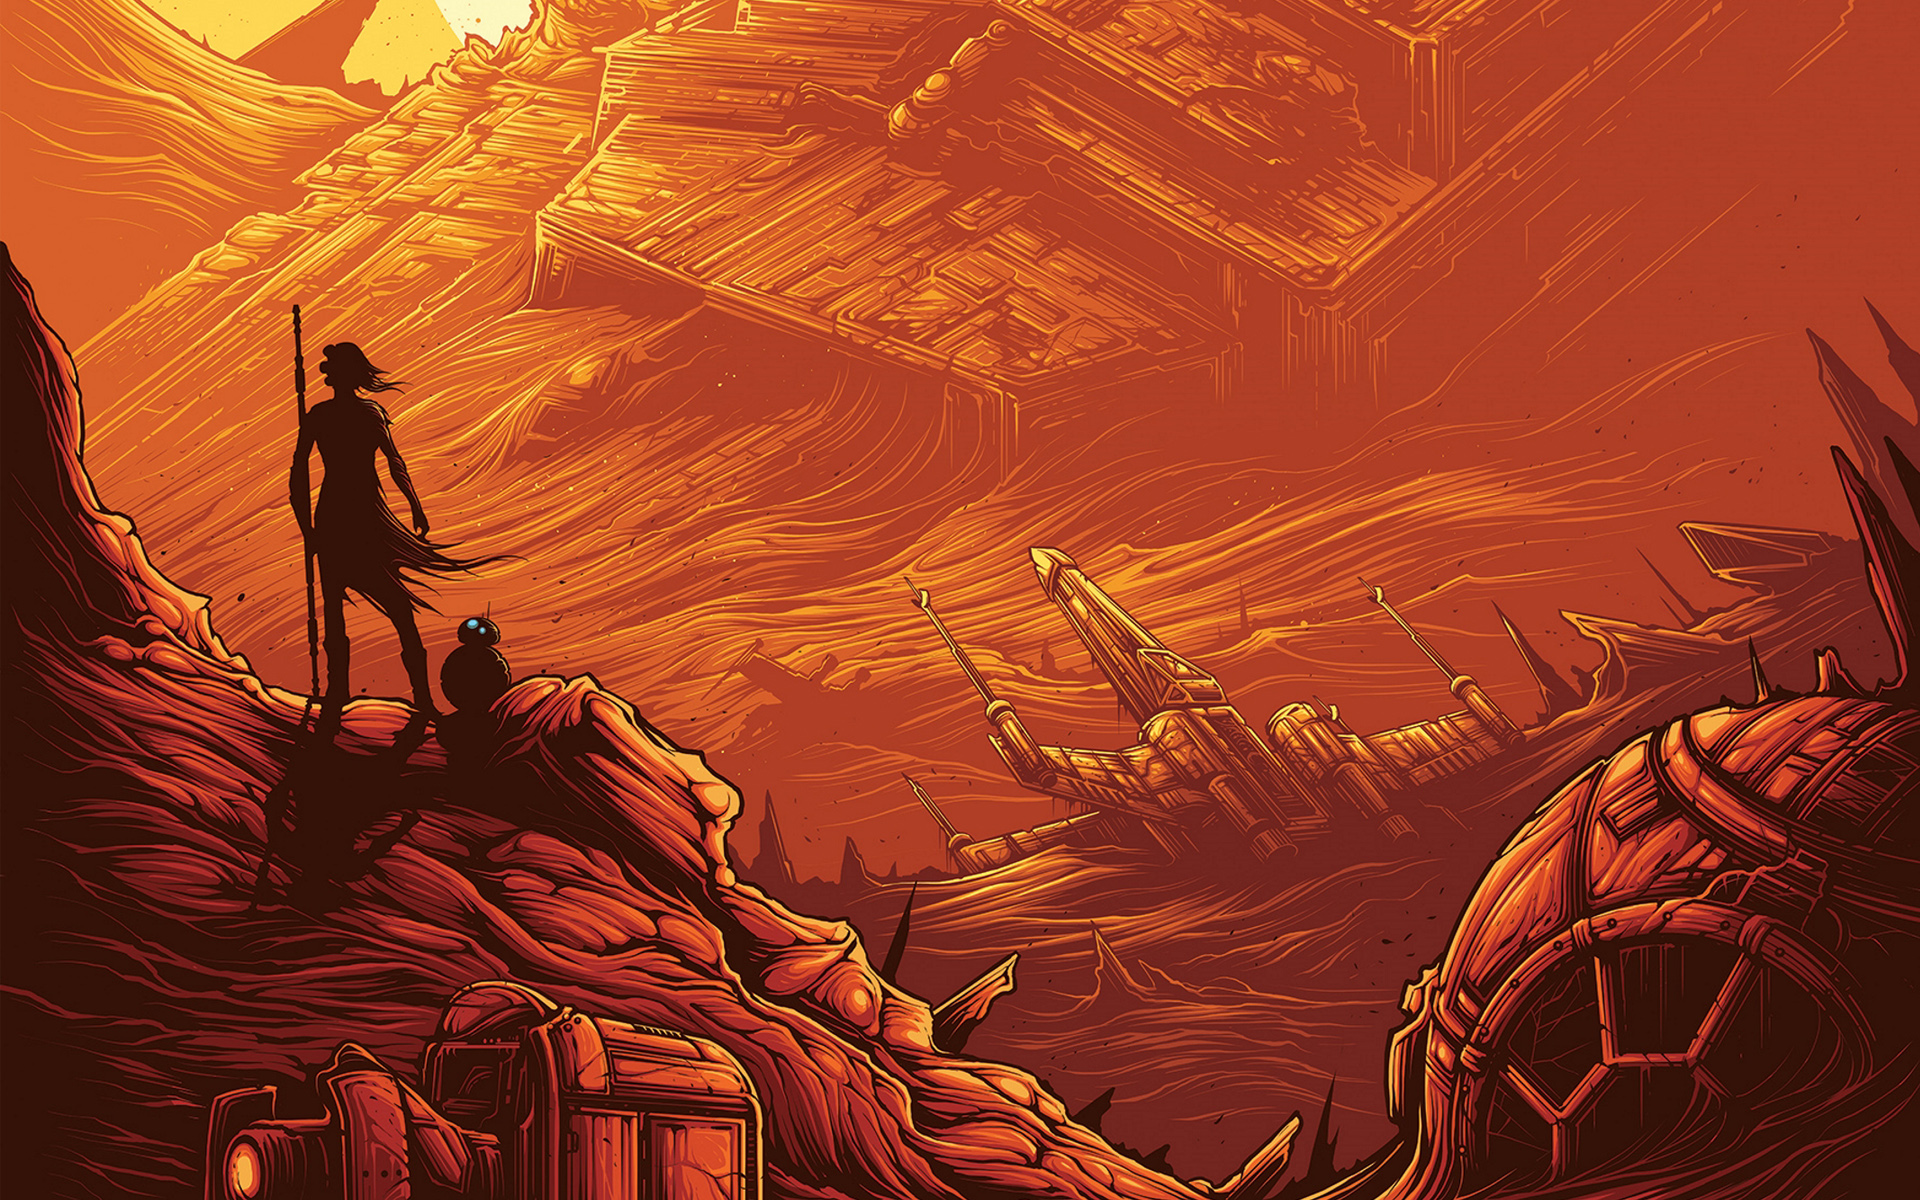 Rey BB 8 Star Wars Wallpapers HD Wallpapers 1920x1200